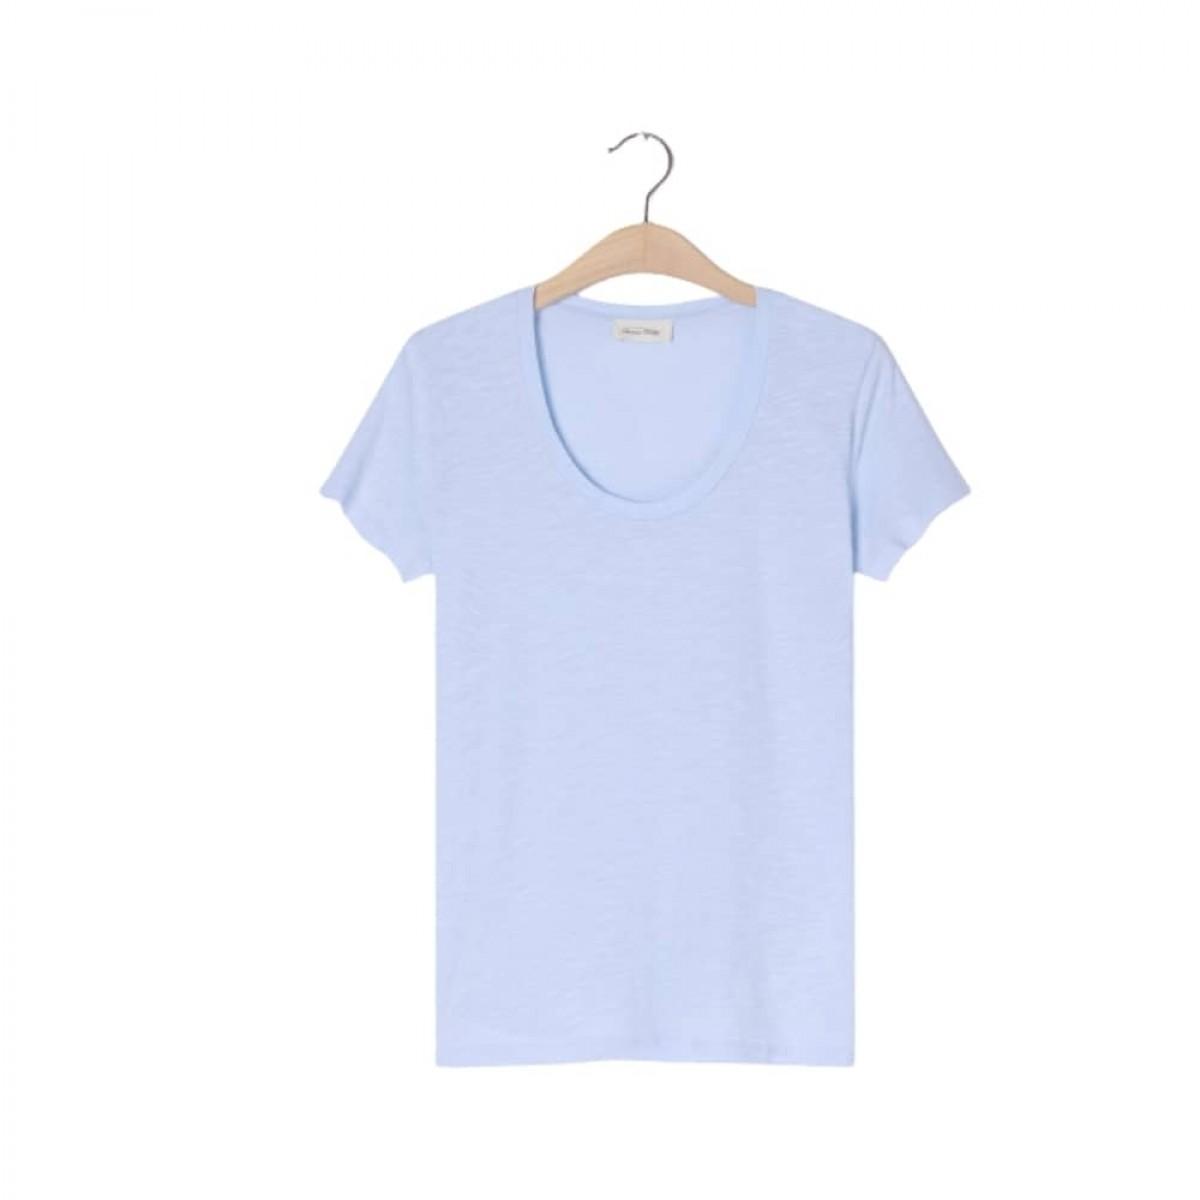 jacksonville t-shirt - vintage blue sky